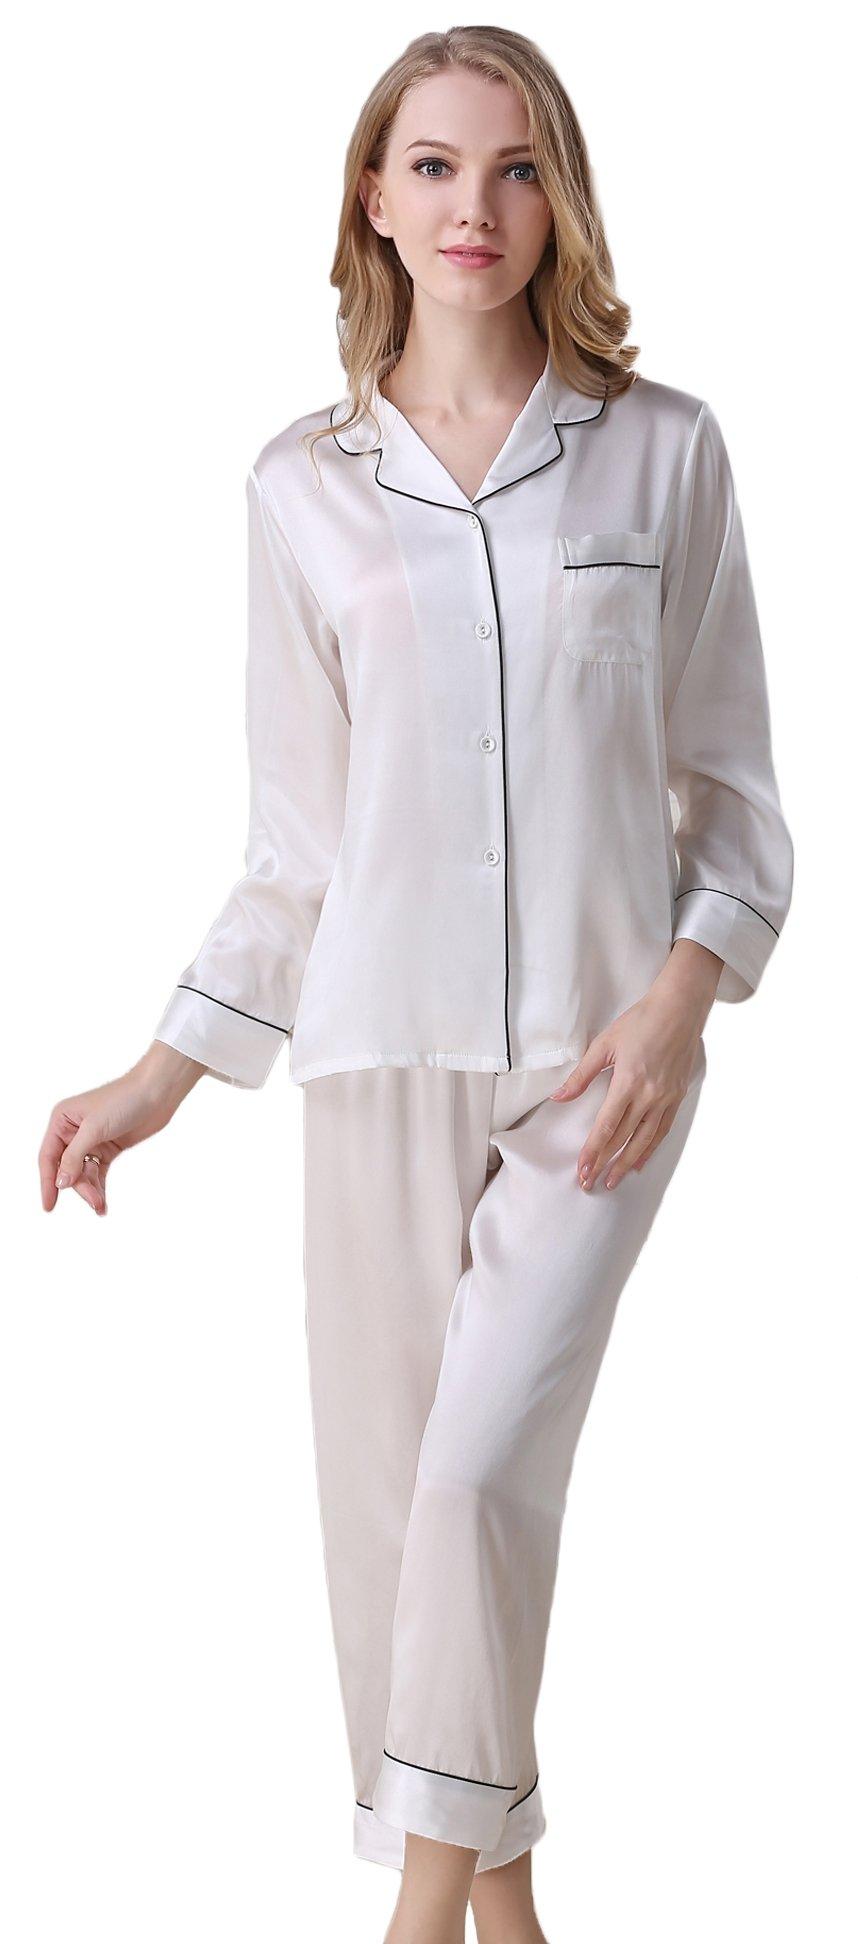 Colorful Silk Luxury Silk Pajamas Sets Homewear Beautiful Gifts White M